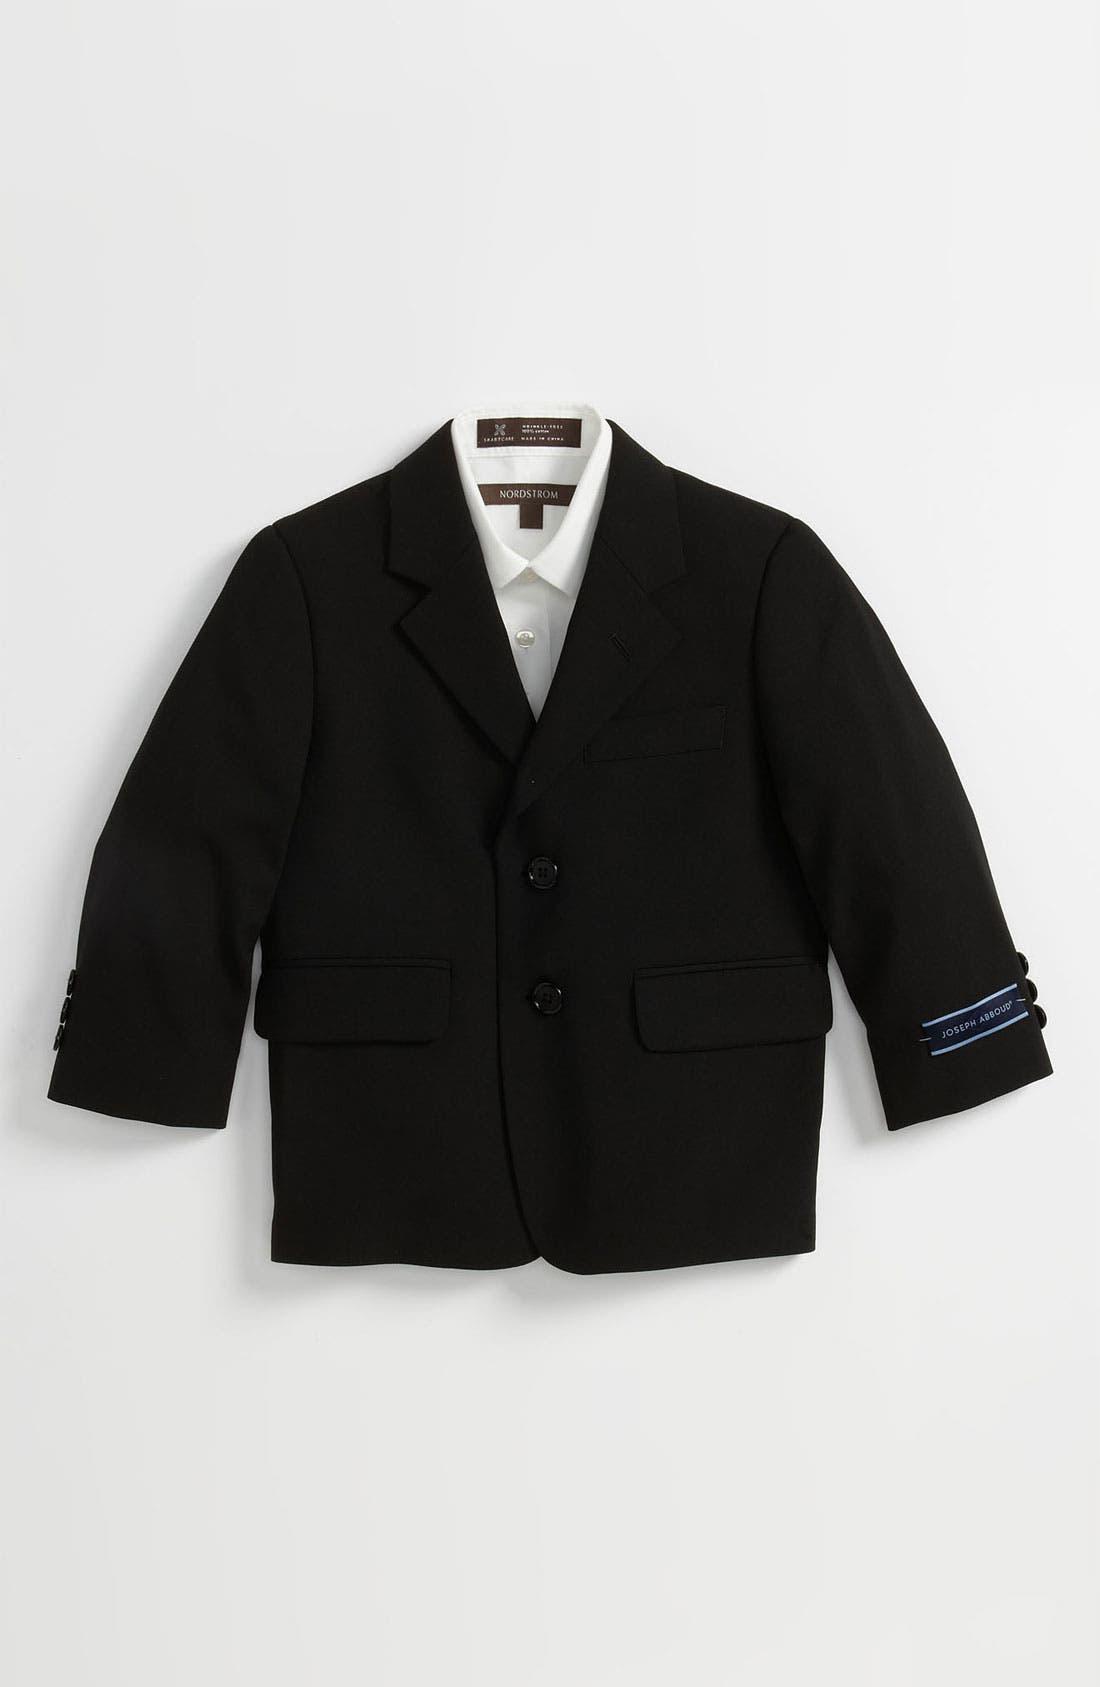 Main Image - Joseph Abboud Suit Blazer (Toddler)